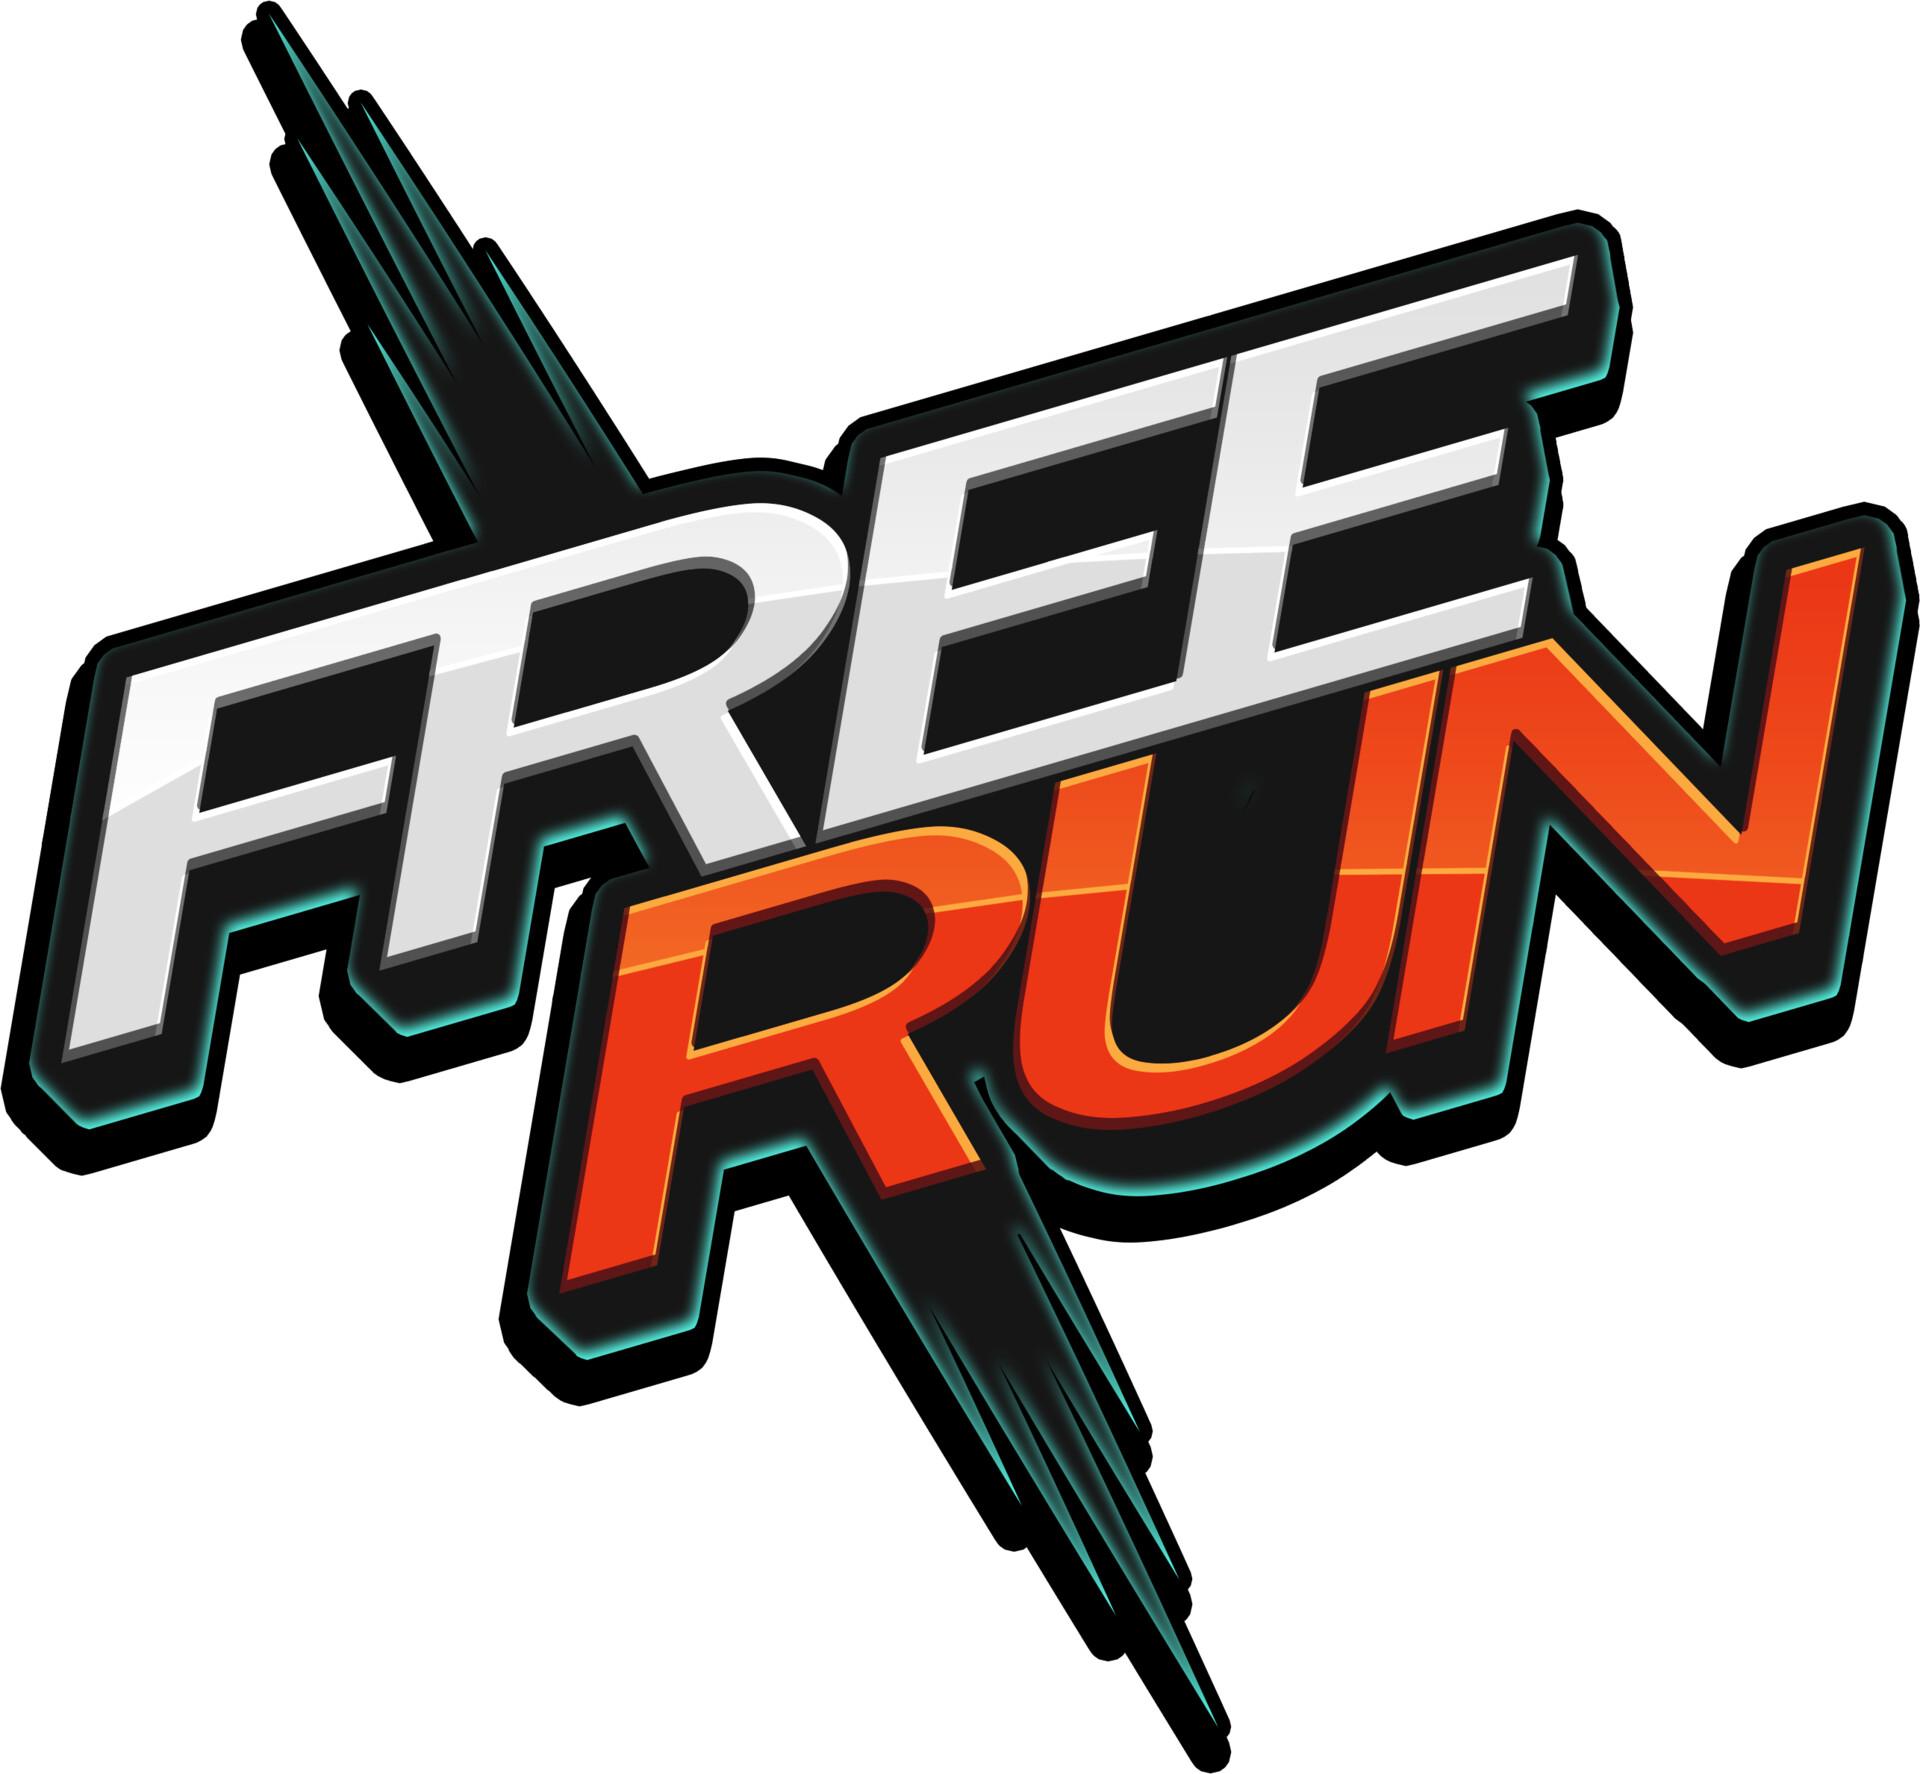 Fatih gurdal freerun2 highrez